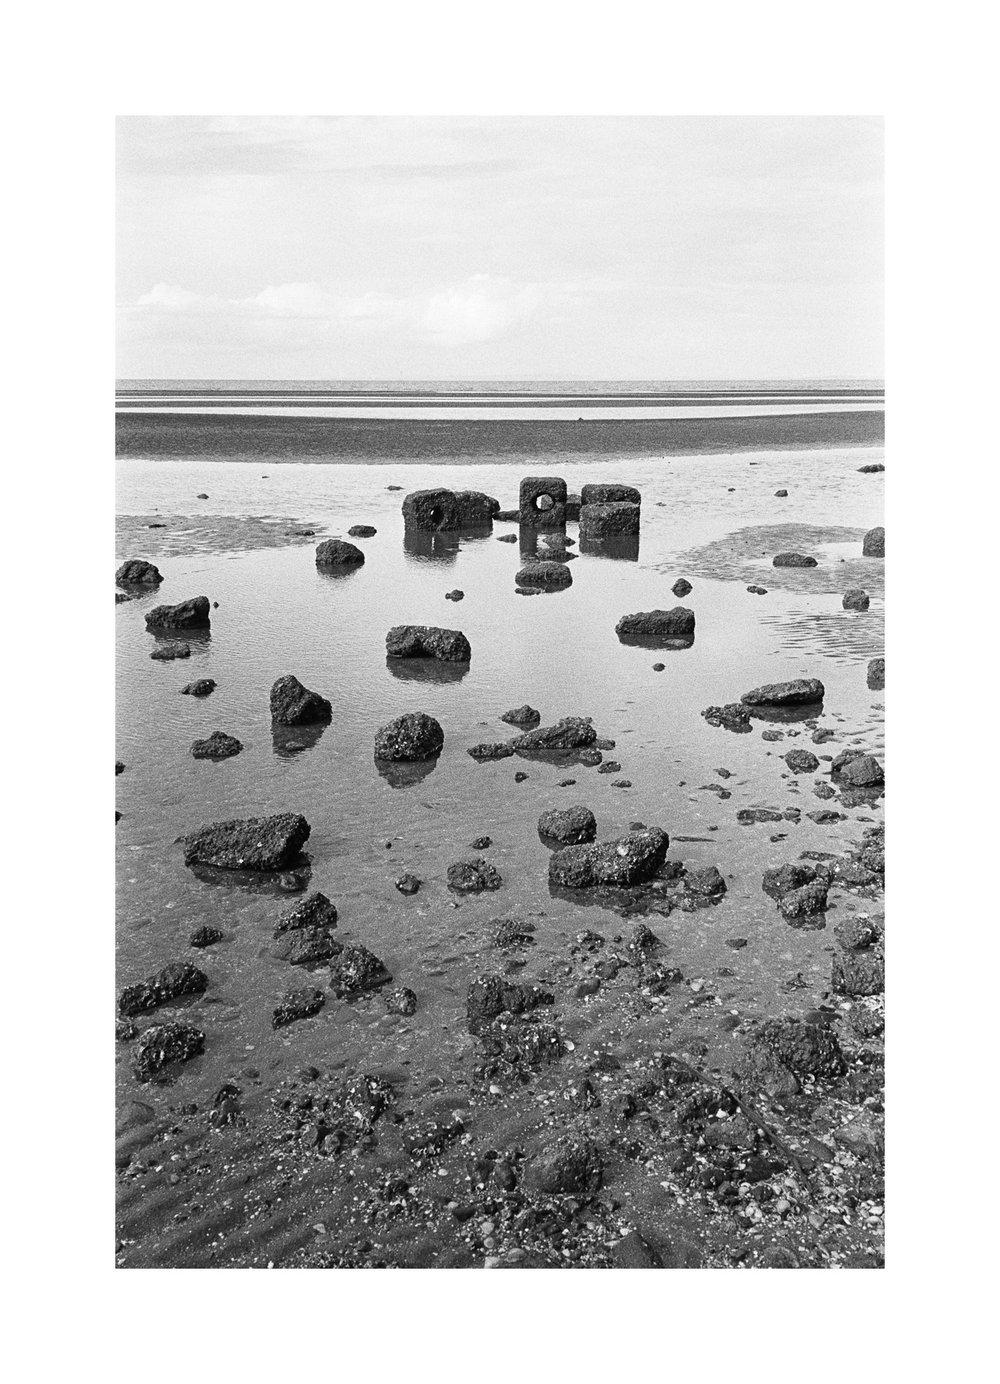 2018106 - Roll 252 - 018-Nick-Bedford,-Photographer-Black and White, Kodak TRI-X 400, Landscape Photography, Leica M7, Seascape, Shorncliffe, Voigtlander 35mm F1.7.jpg